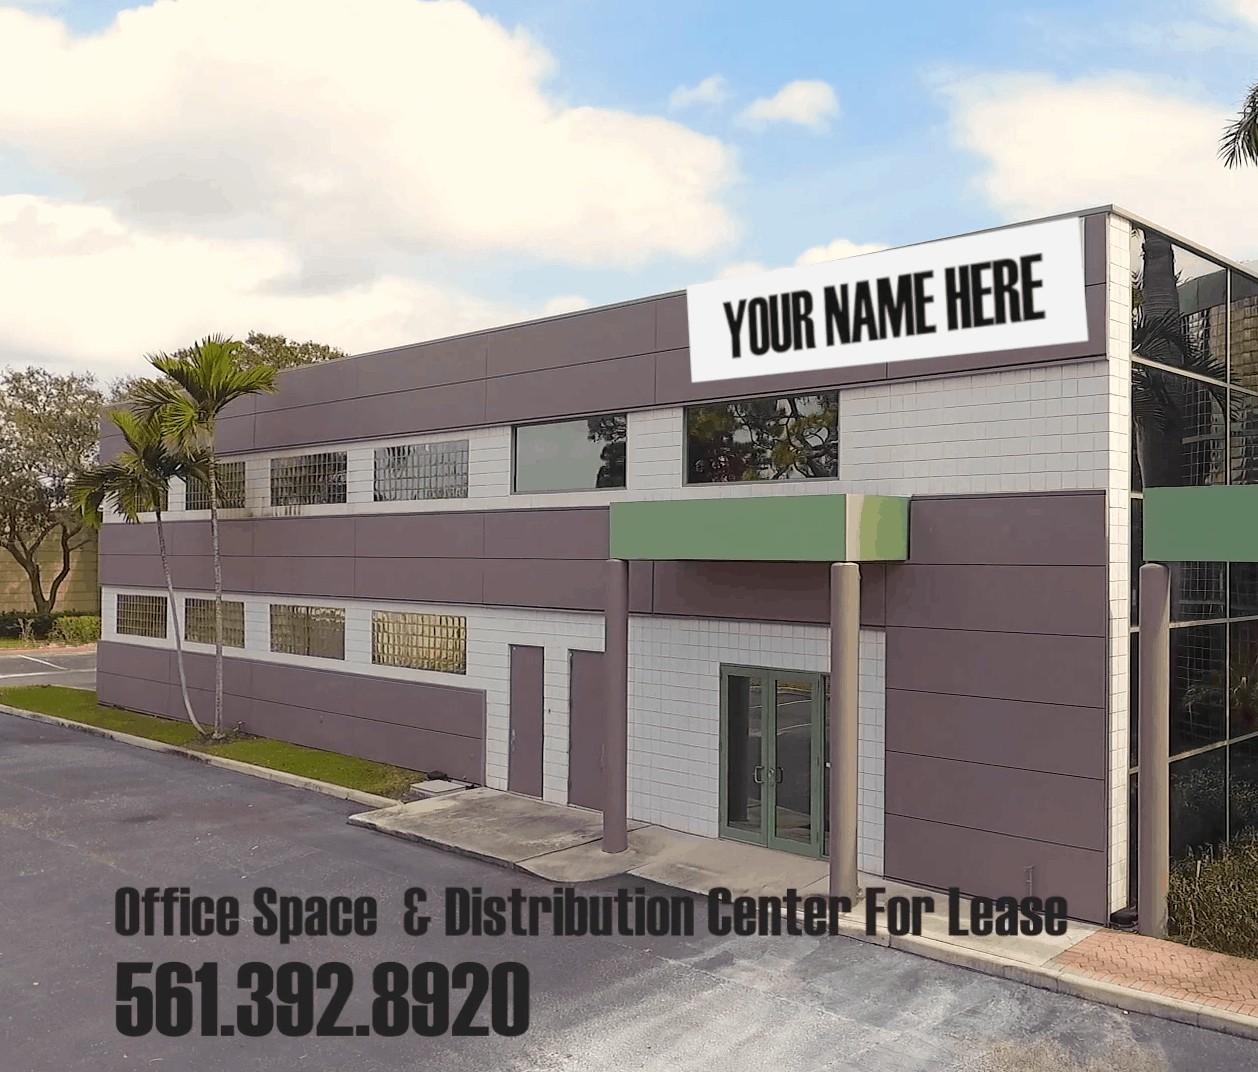 building exterior image